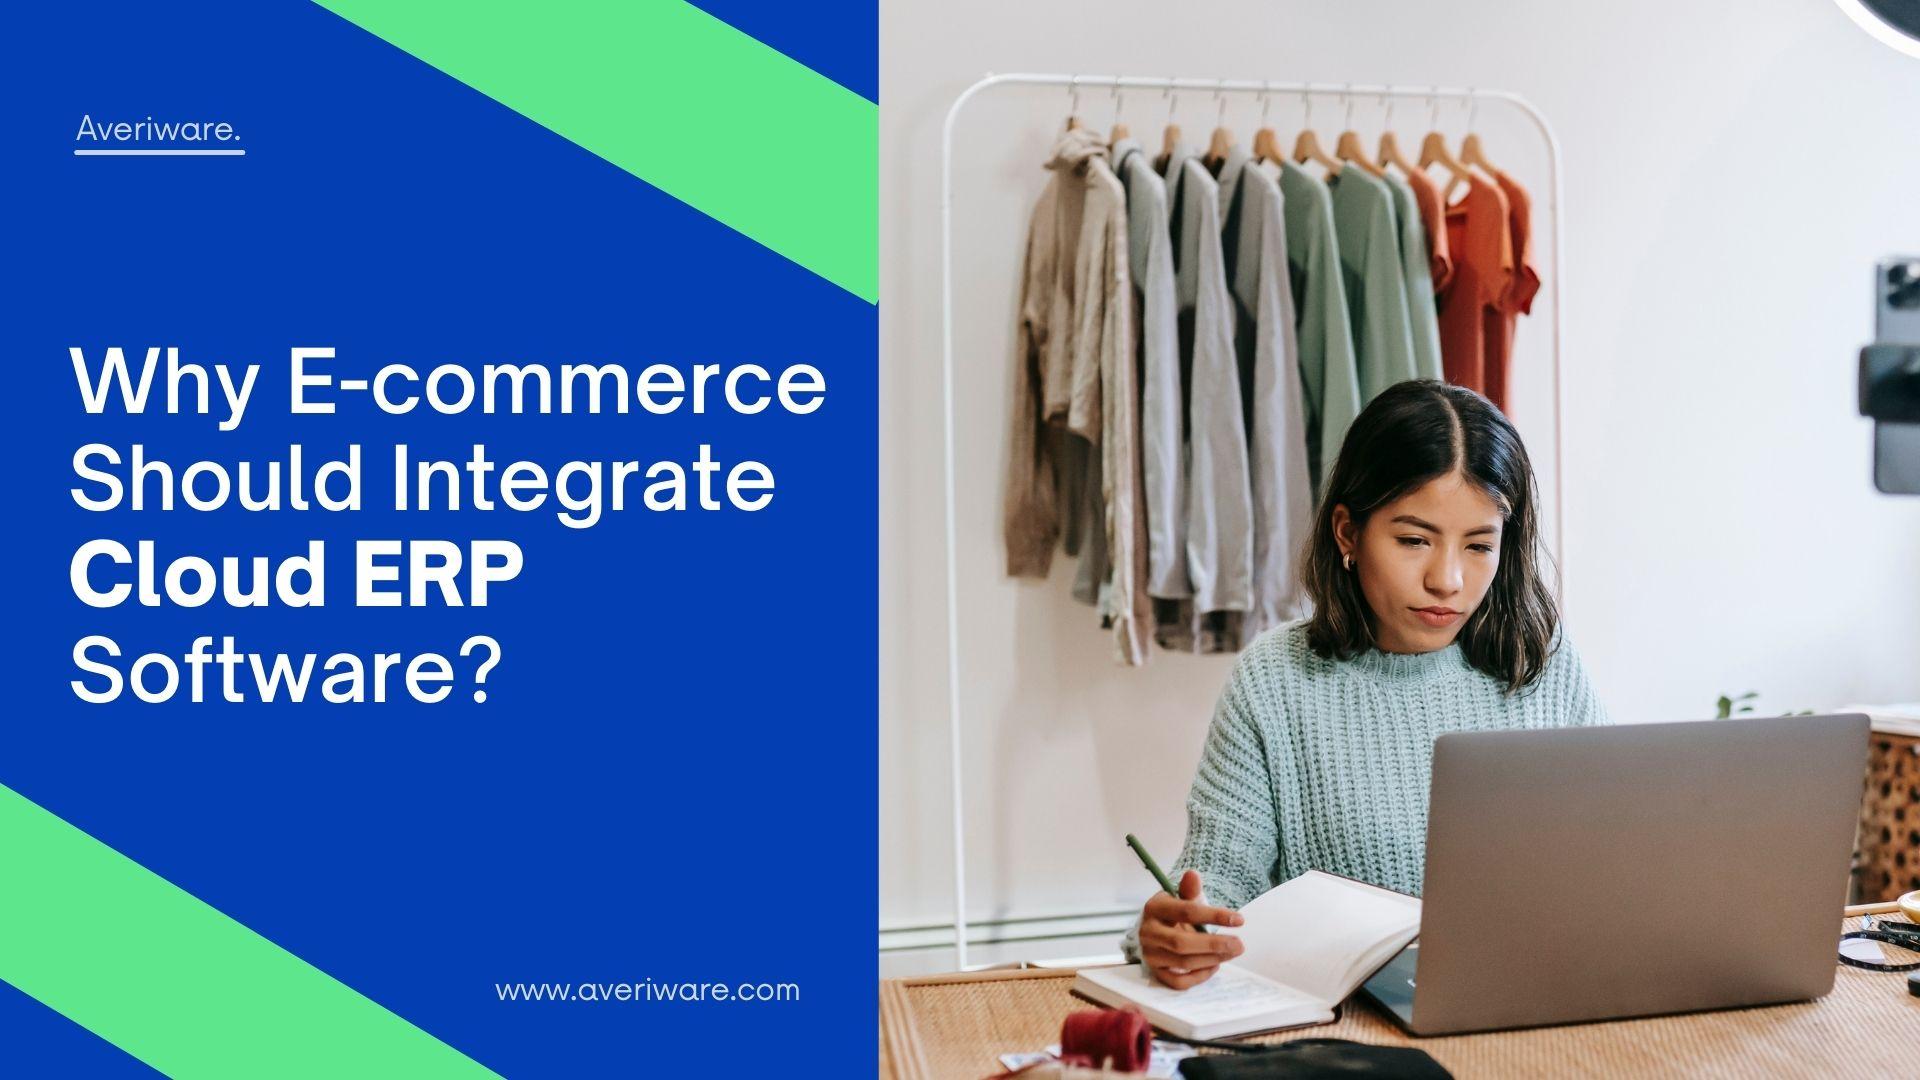 E-commerce Should Integrate Cloud ERP Software